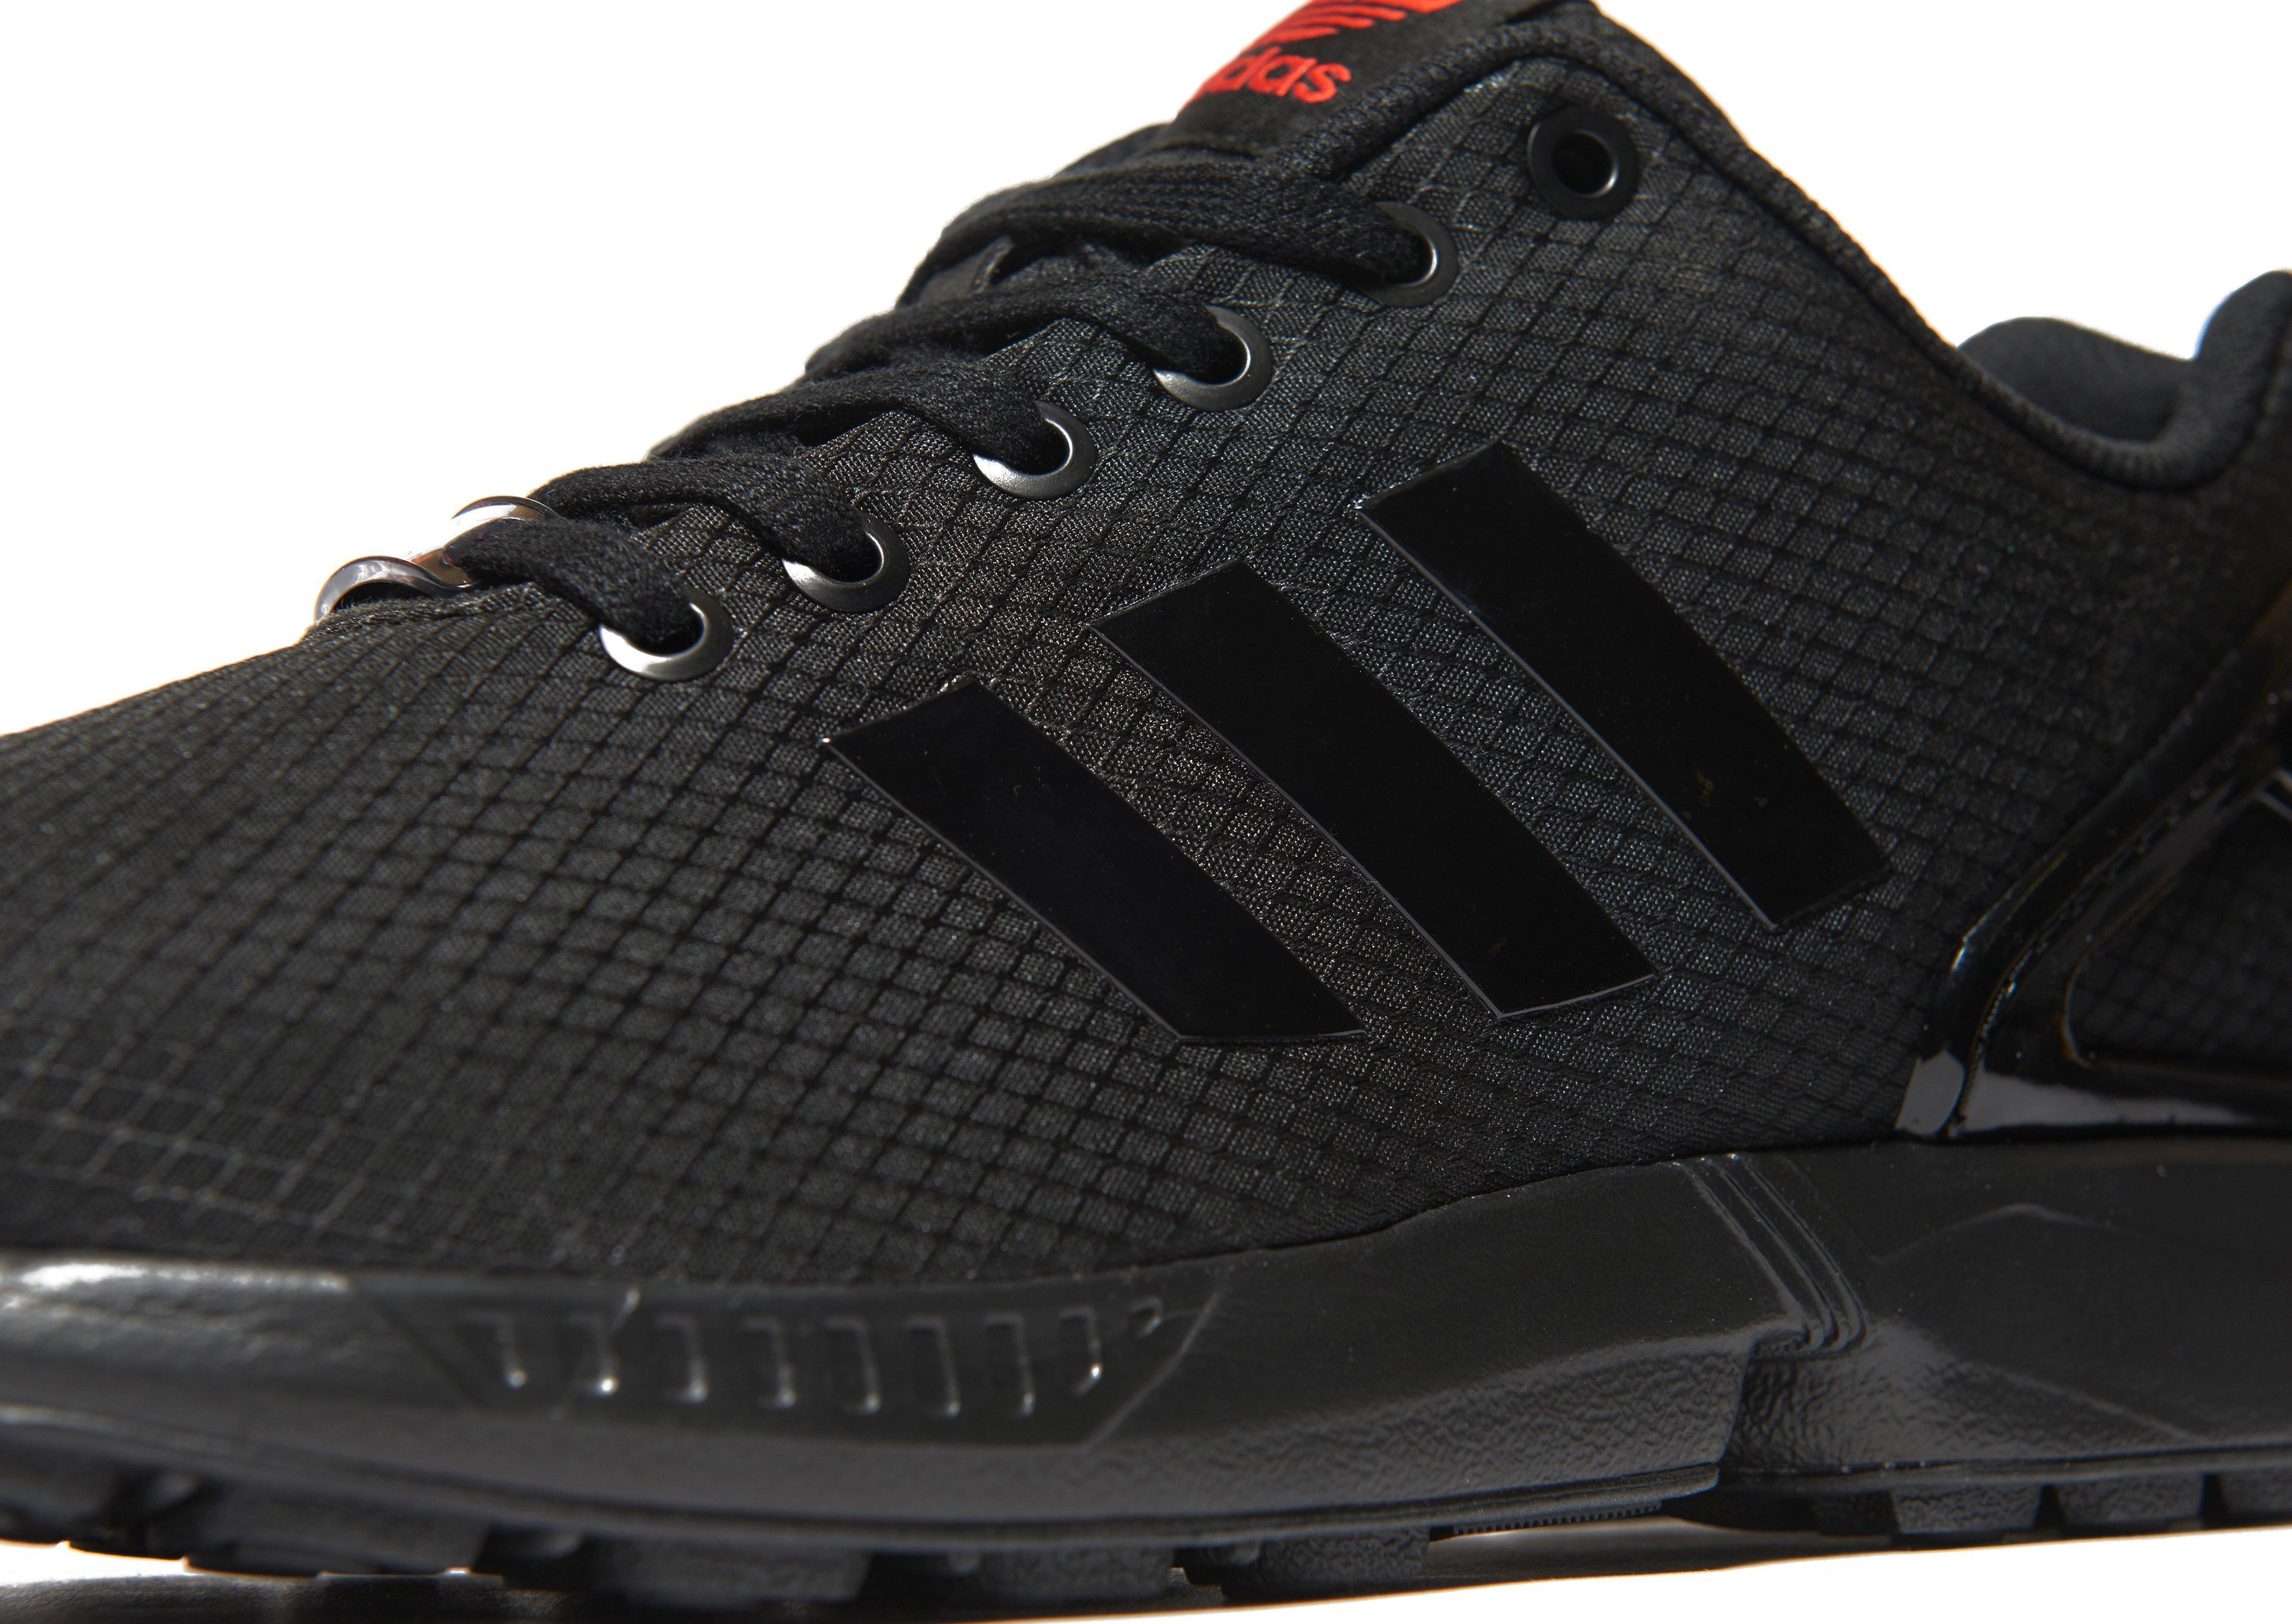 58c4cb9d8 Lyst - adidas Originals Zx Flux Ripstop in Black for Men